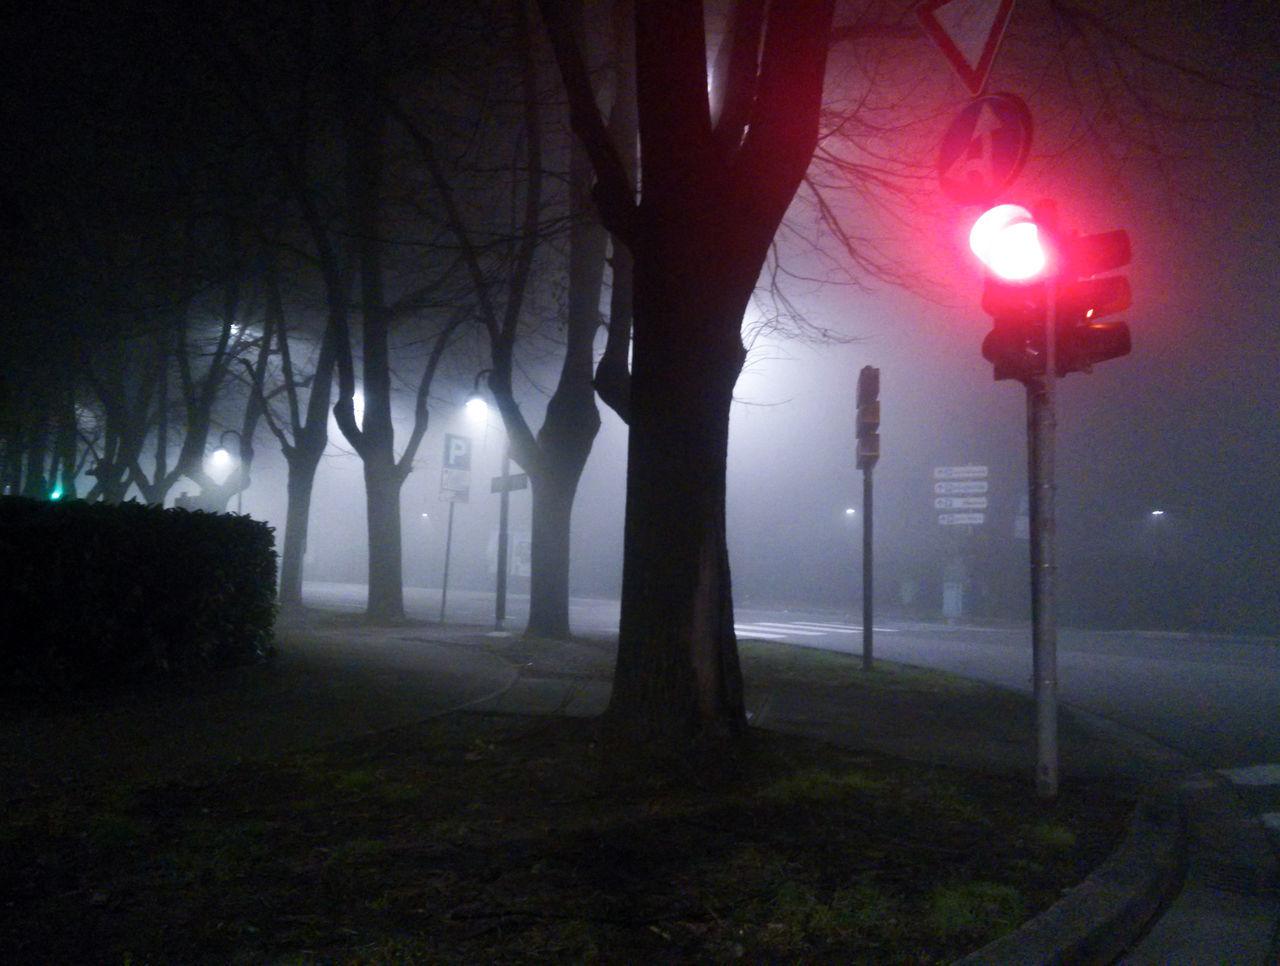 Night Fog Illuminated Tree Traffic Lights Lighting Equipment Sky Surreal Landscape No People Forest Nature Outdoors Moon